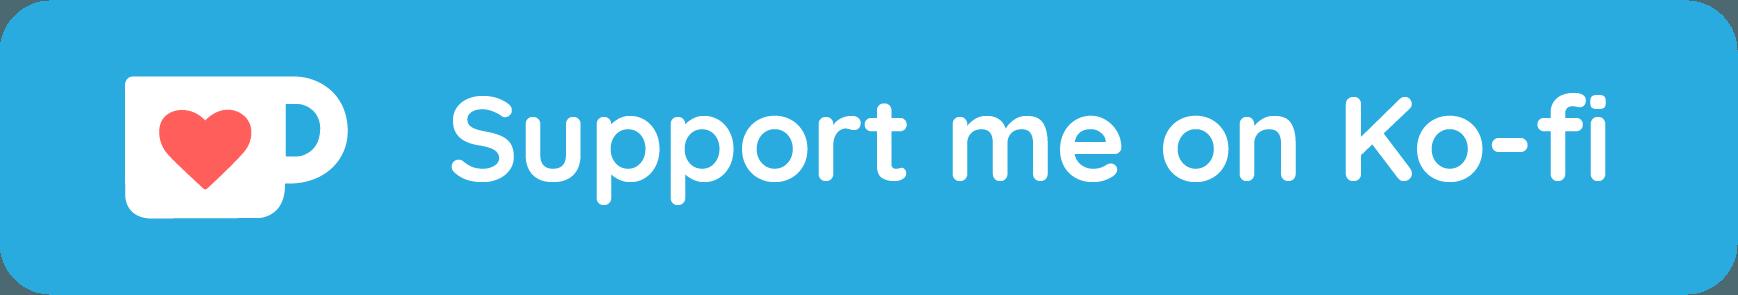 Ko-fi support me